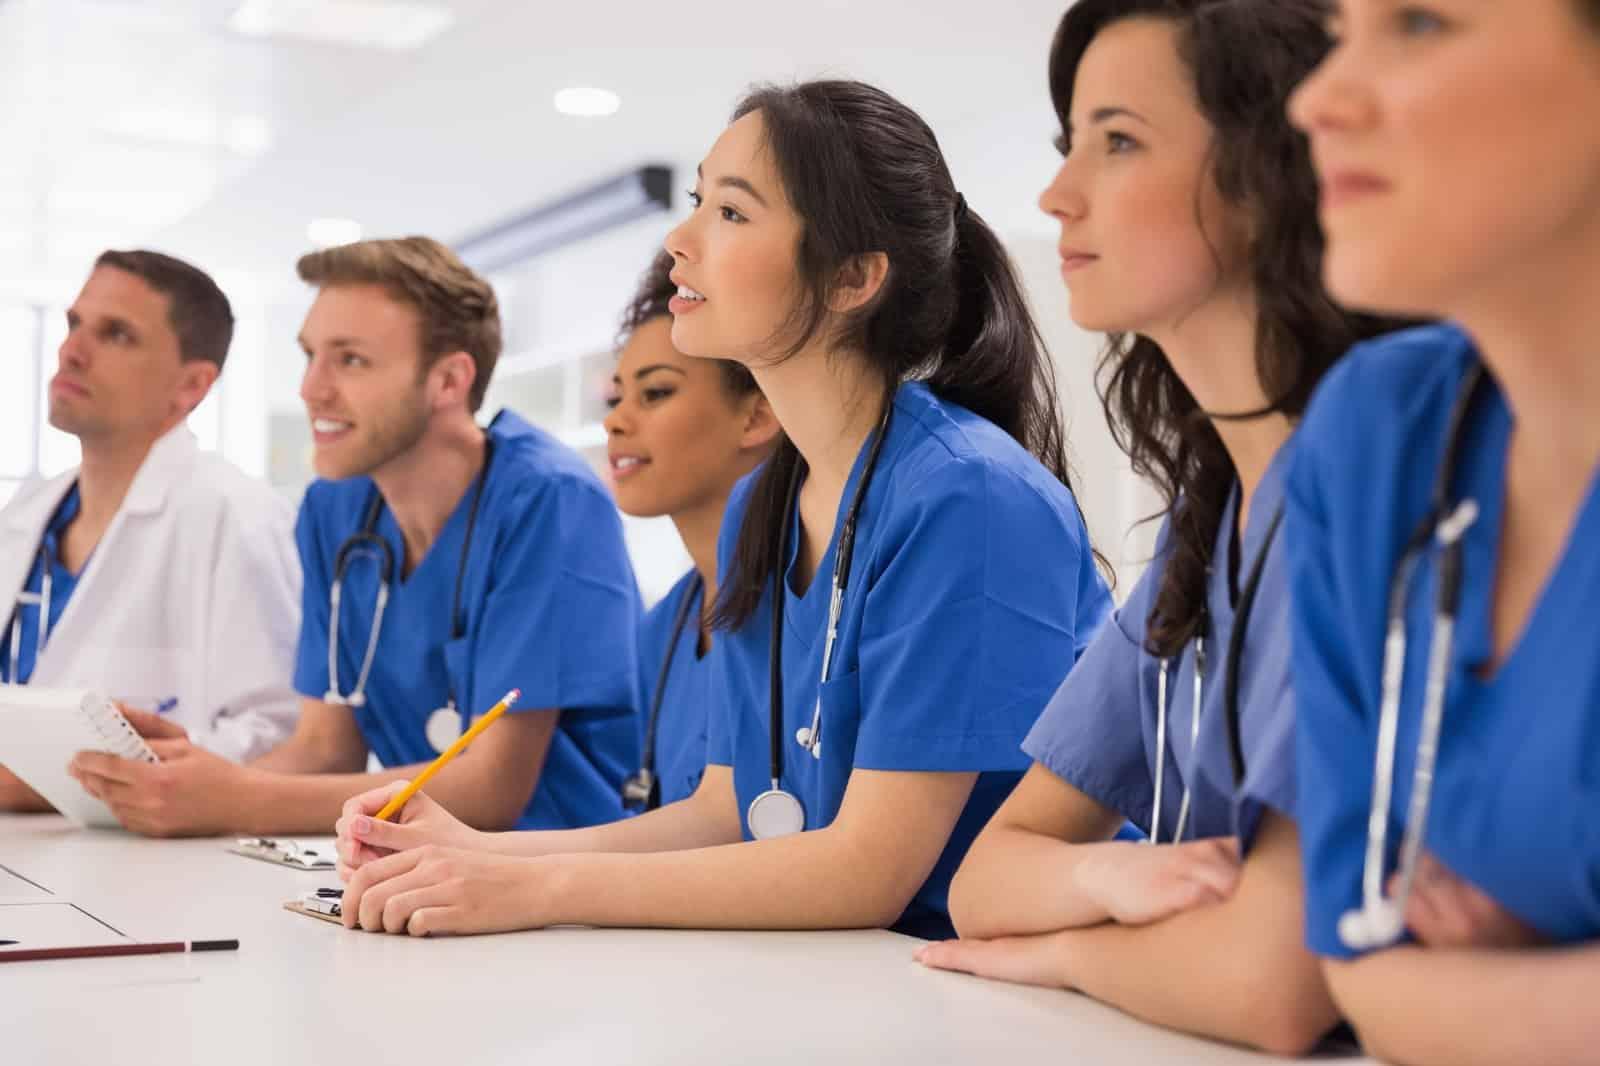 Nursing students in scrubs attend class at nursing school